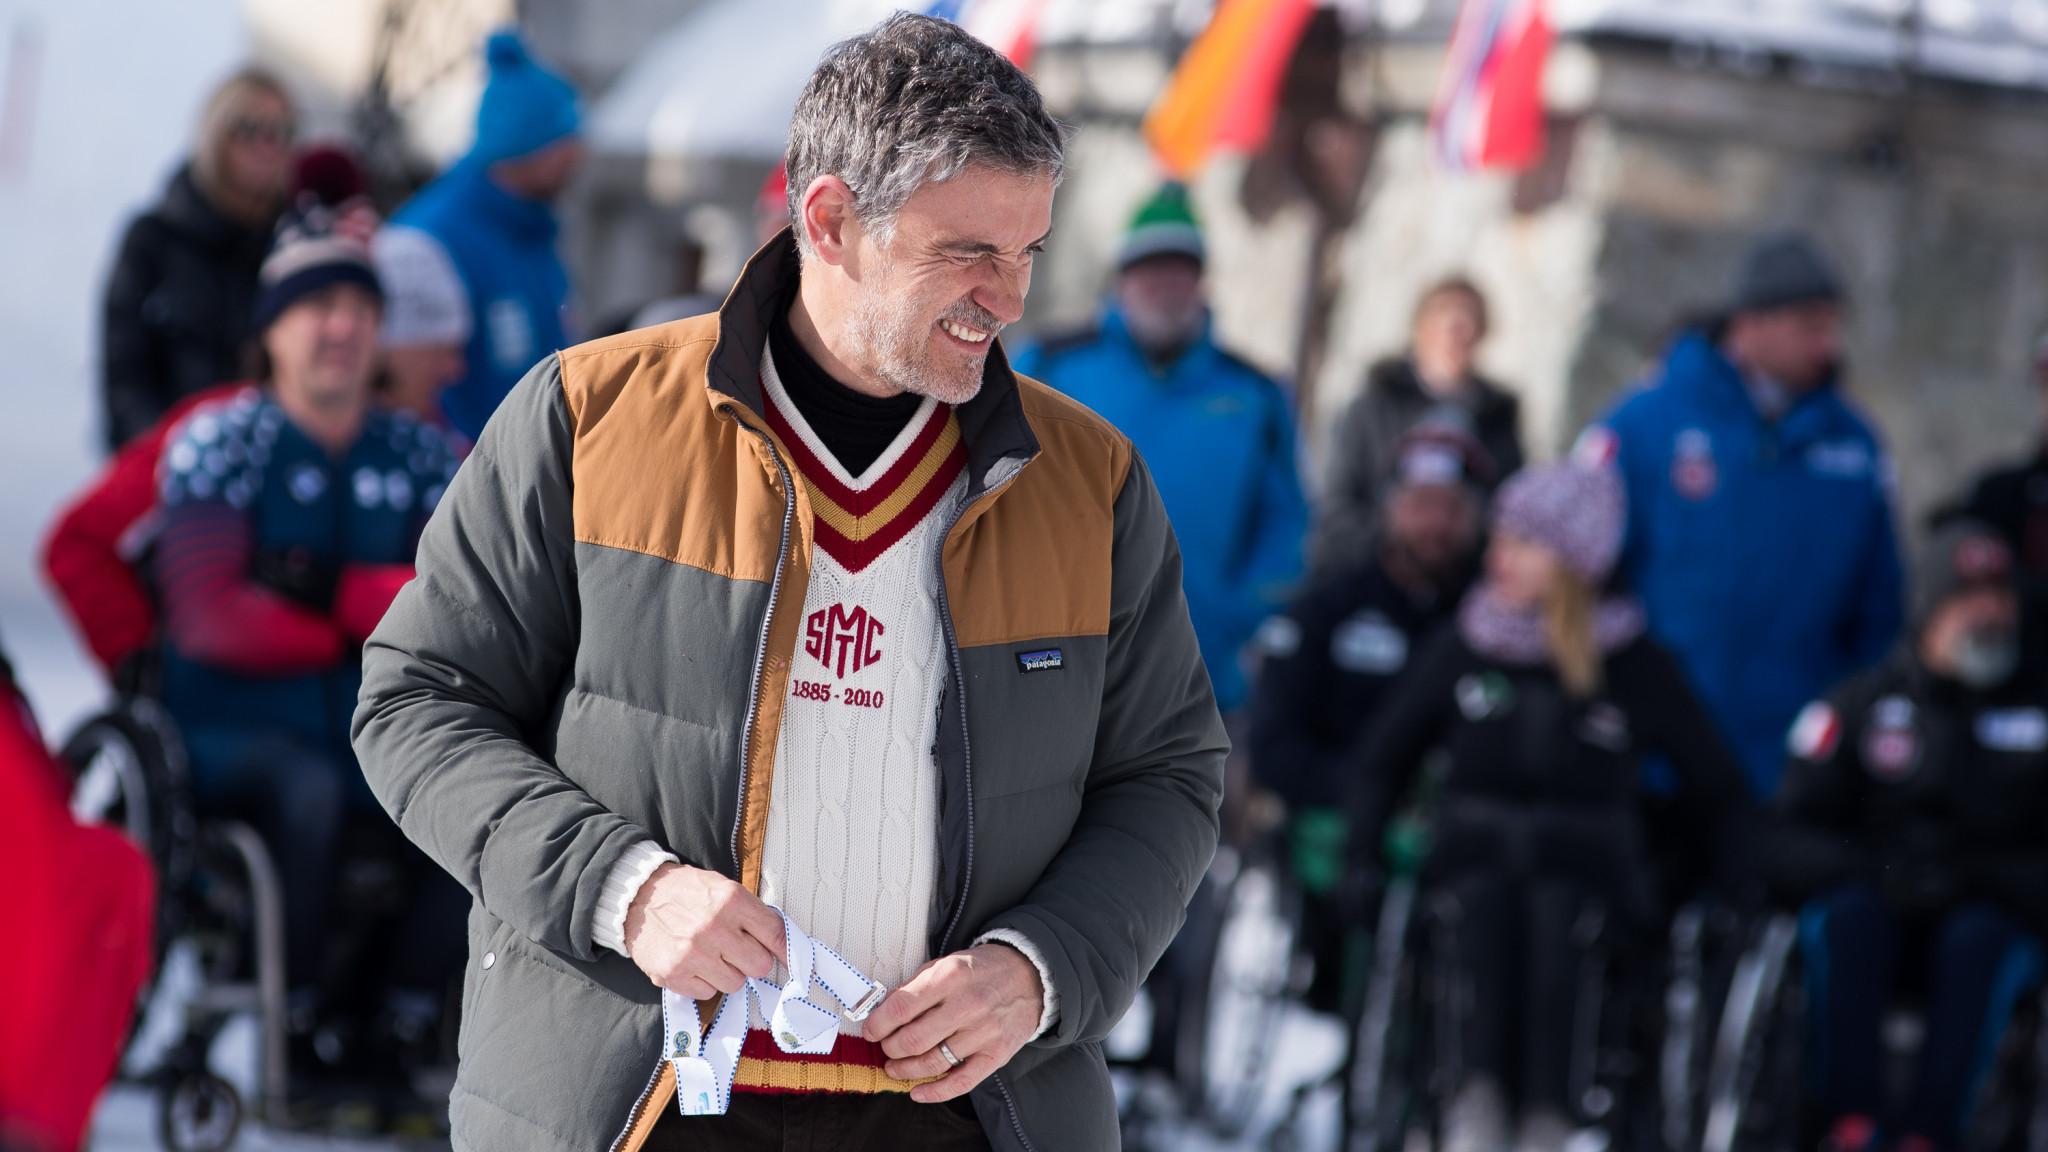 Fritz Burkard is also seeking election as President of the IBSF ©Fritz Burkard